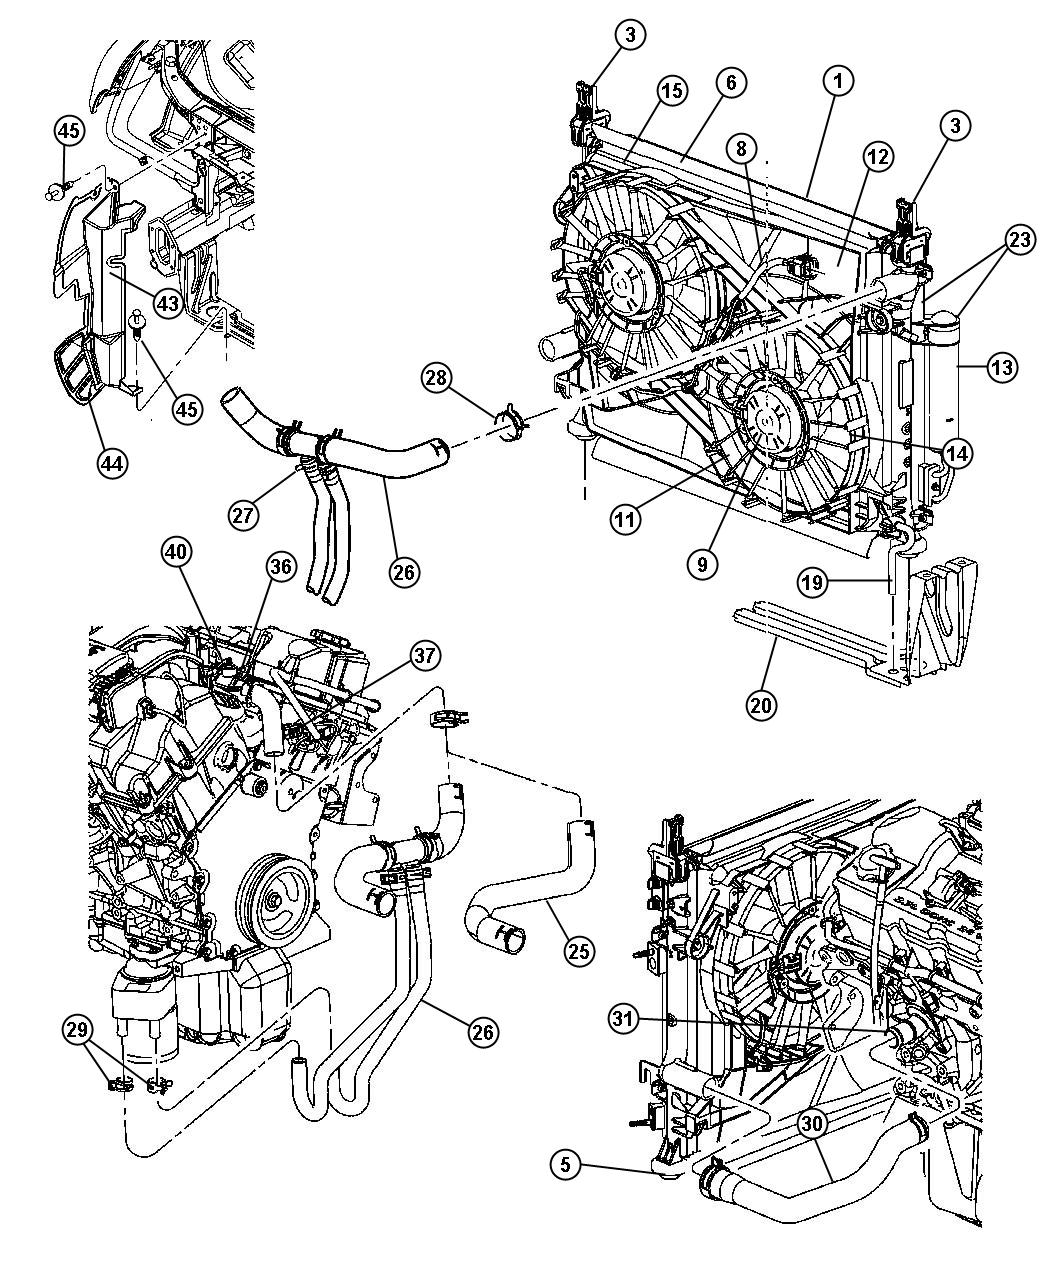 DIAGRAM] 2002 Dodge Intrepid 2 7l Engine Diagram FULL Version HD Quality Engine  Diagram - WALLETCASEFORIPHONES.RAPFRANCE.FRfasco motors wiring diagram download